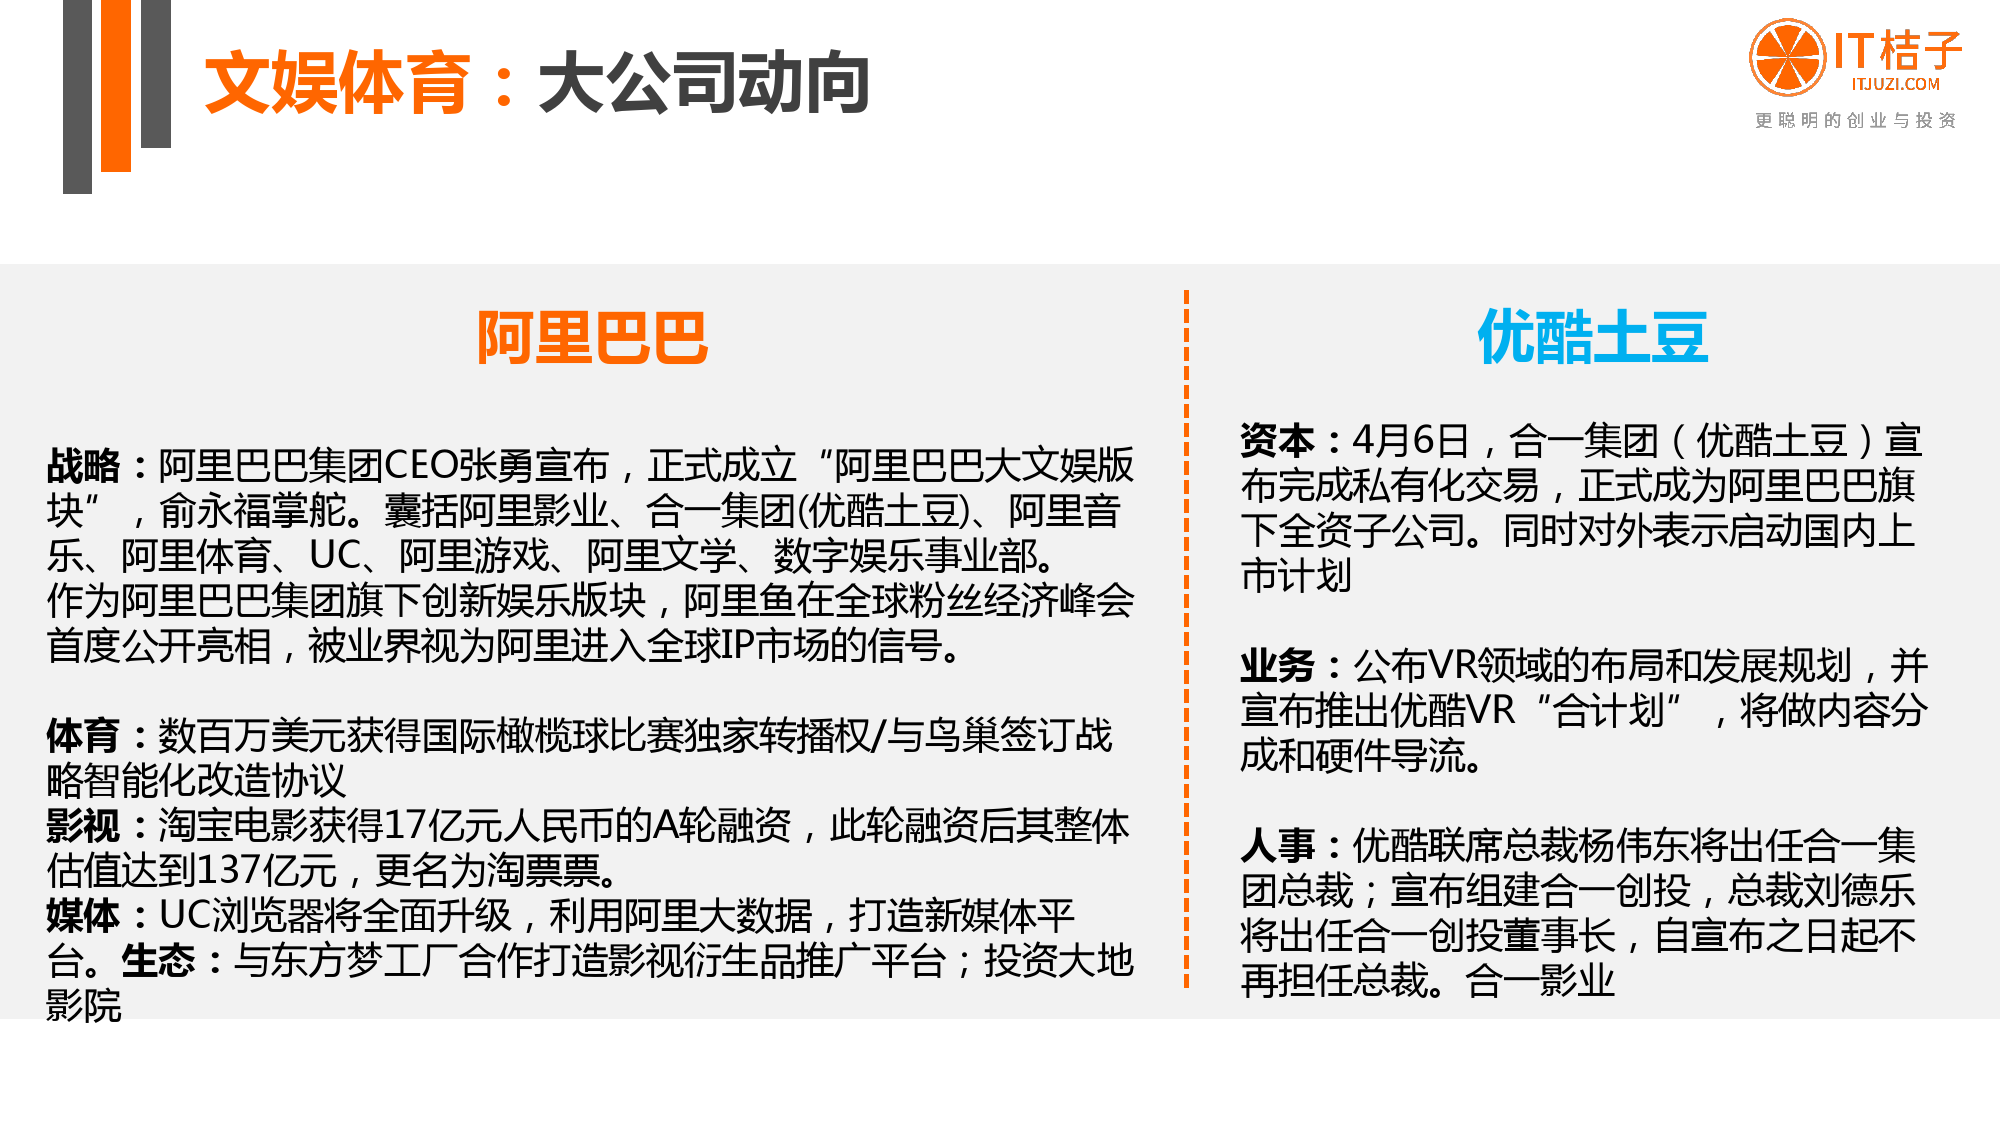 【IT桔子】2016年Q2中国互联网创业投资分析报告_000028